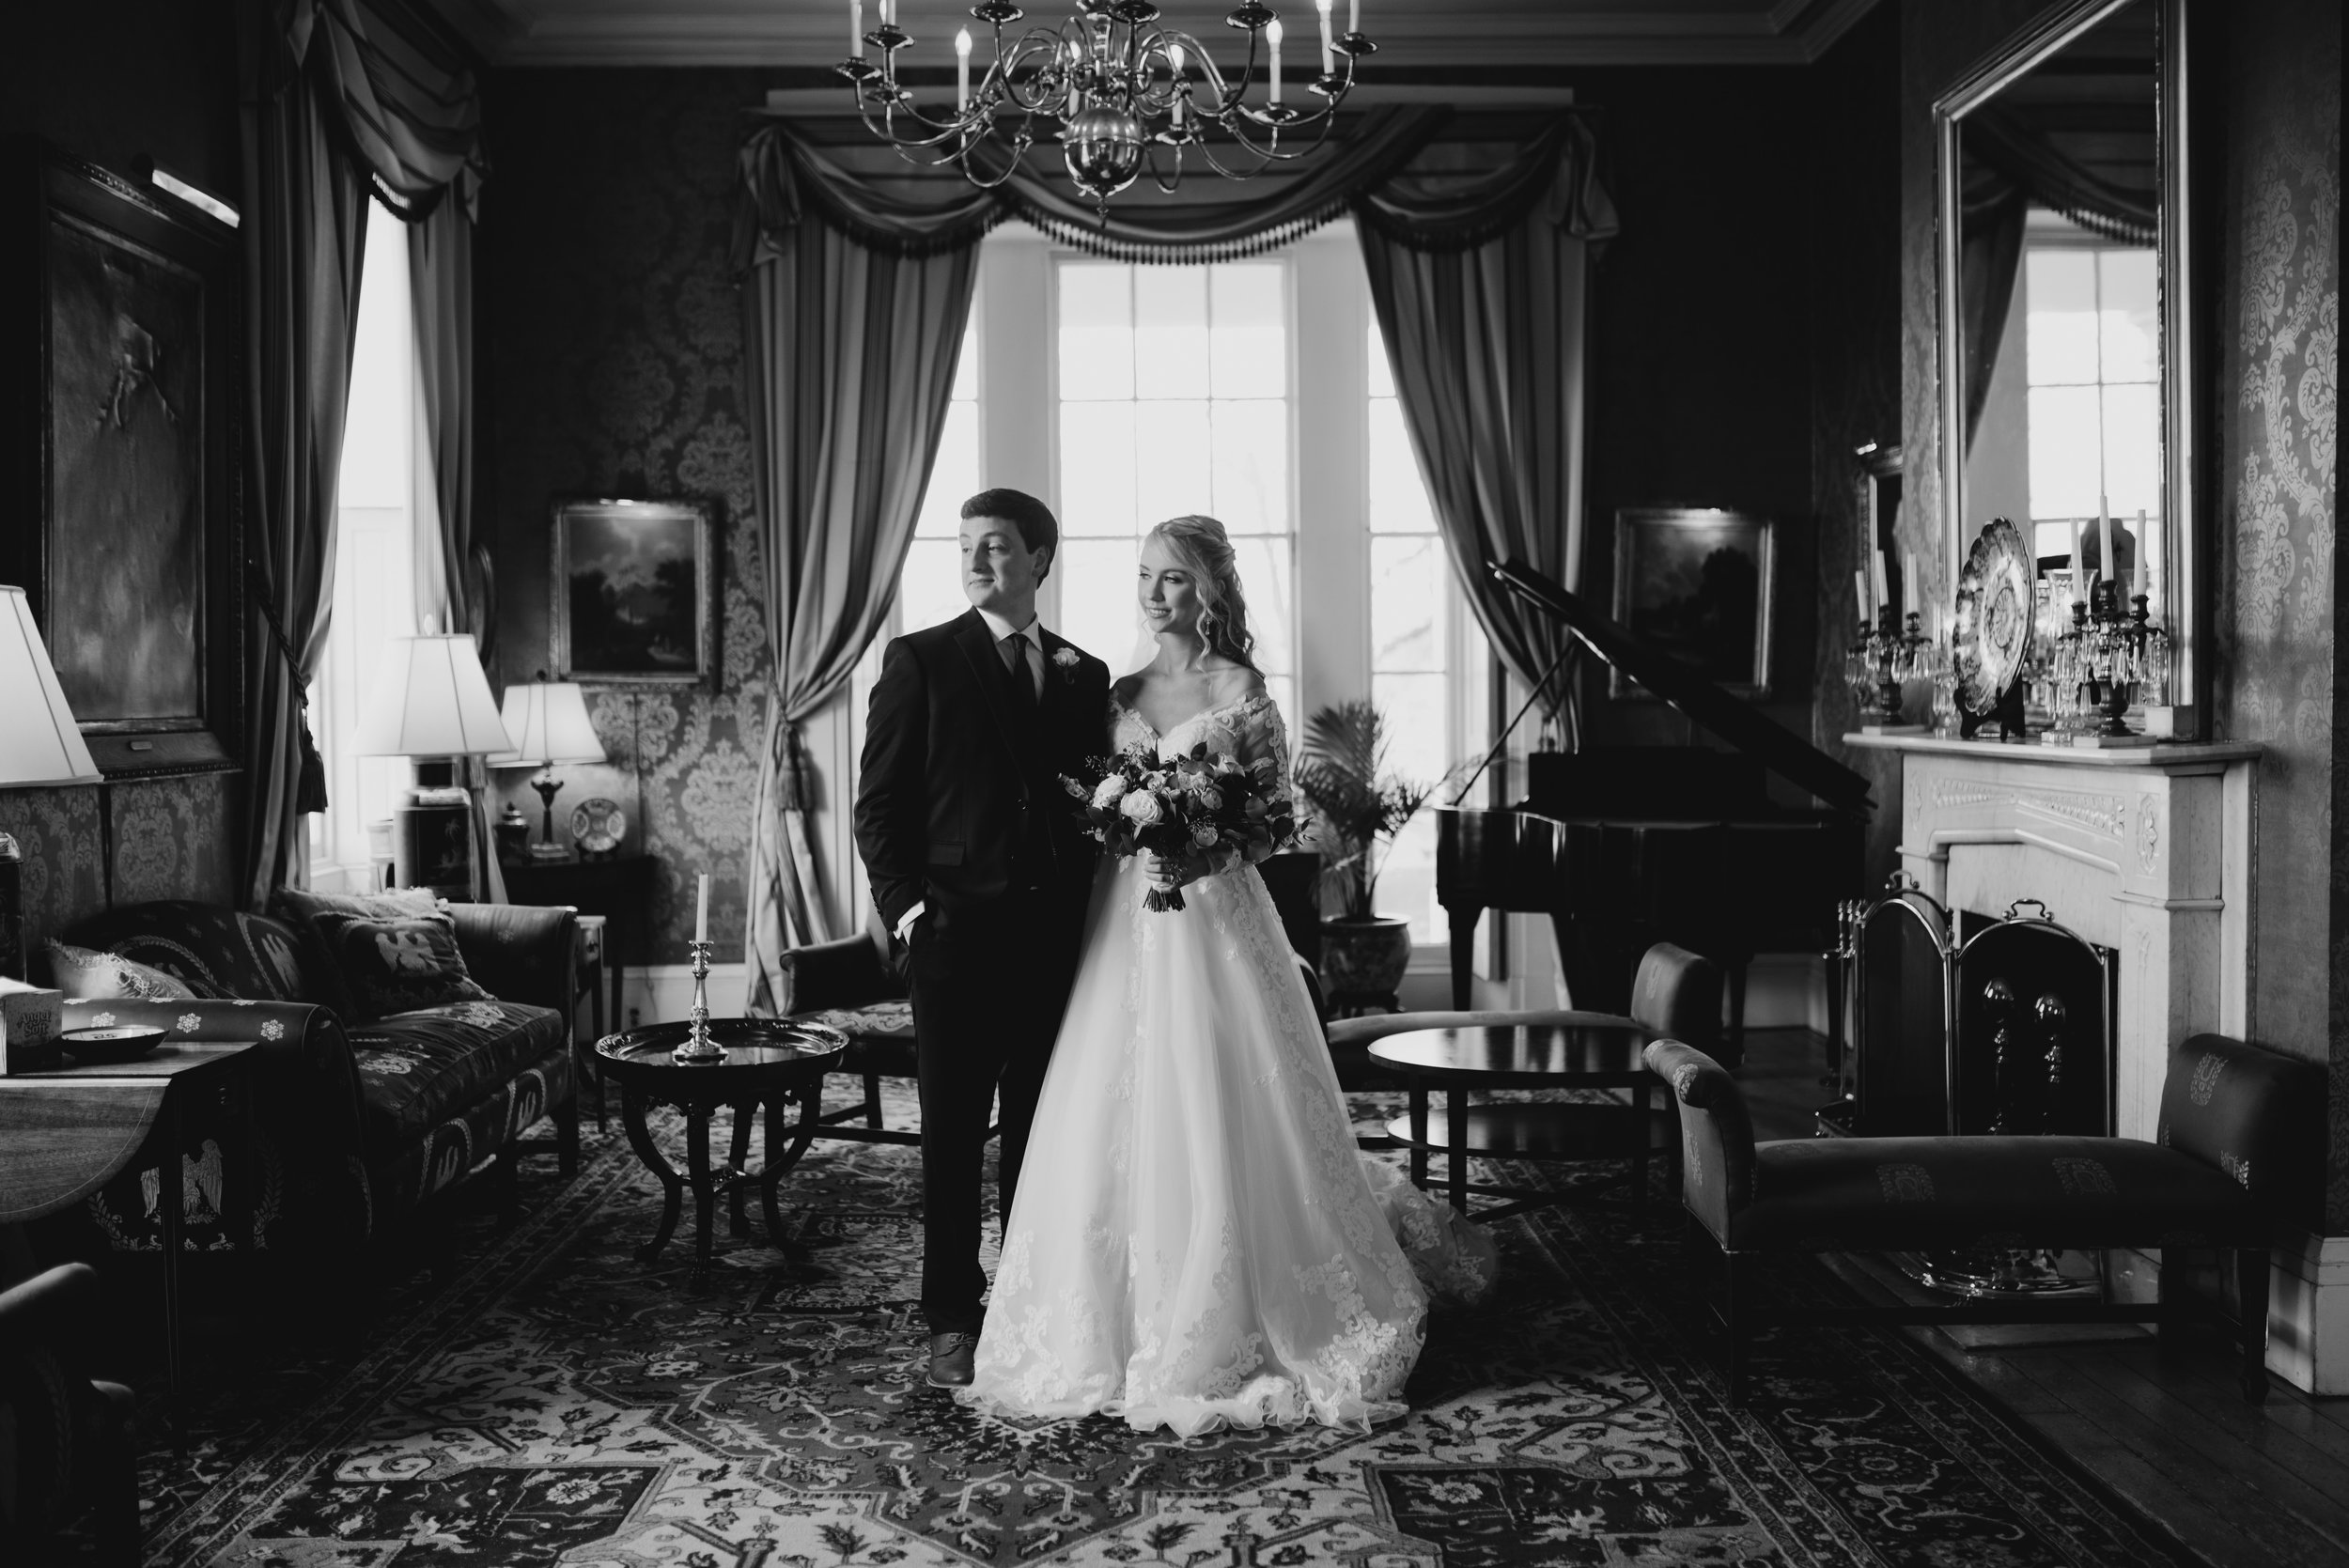 antrim-18444-spencer-wedding-981.jpg